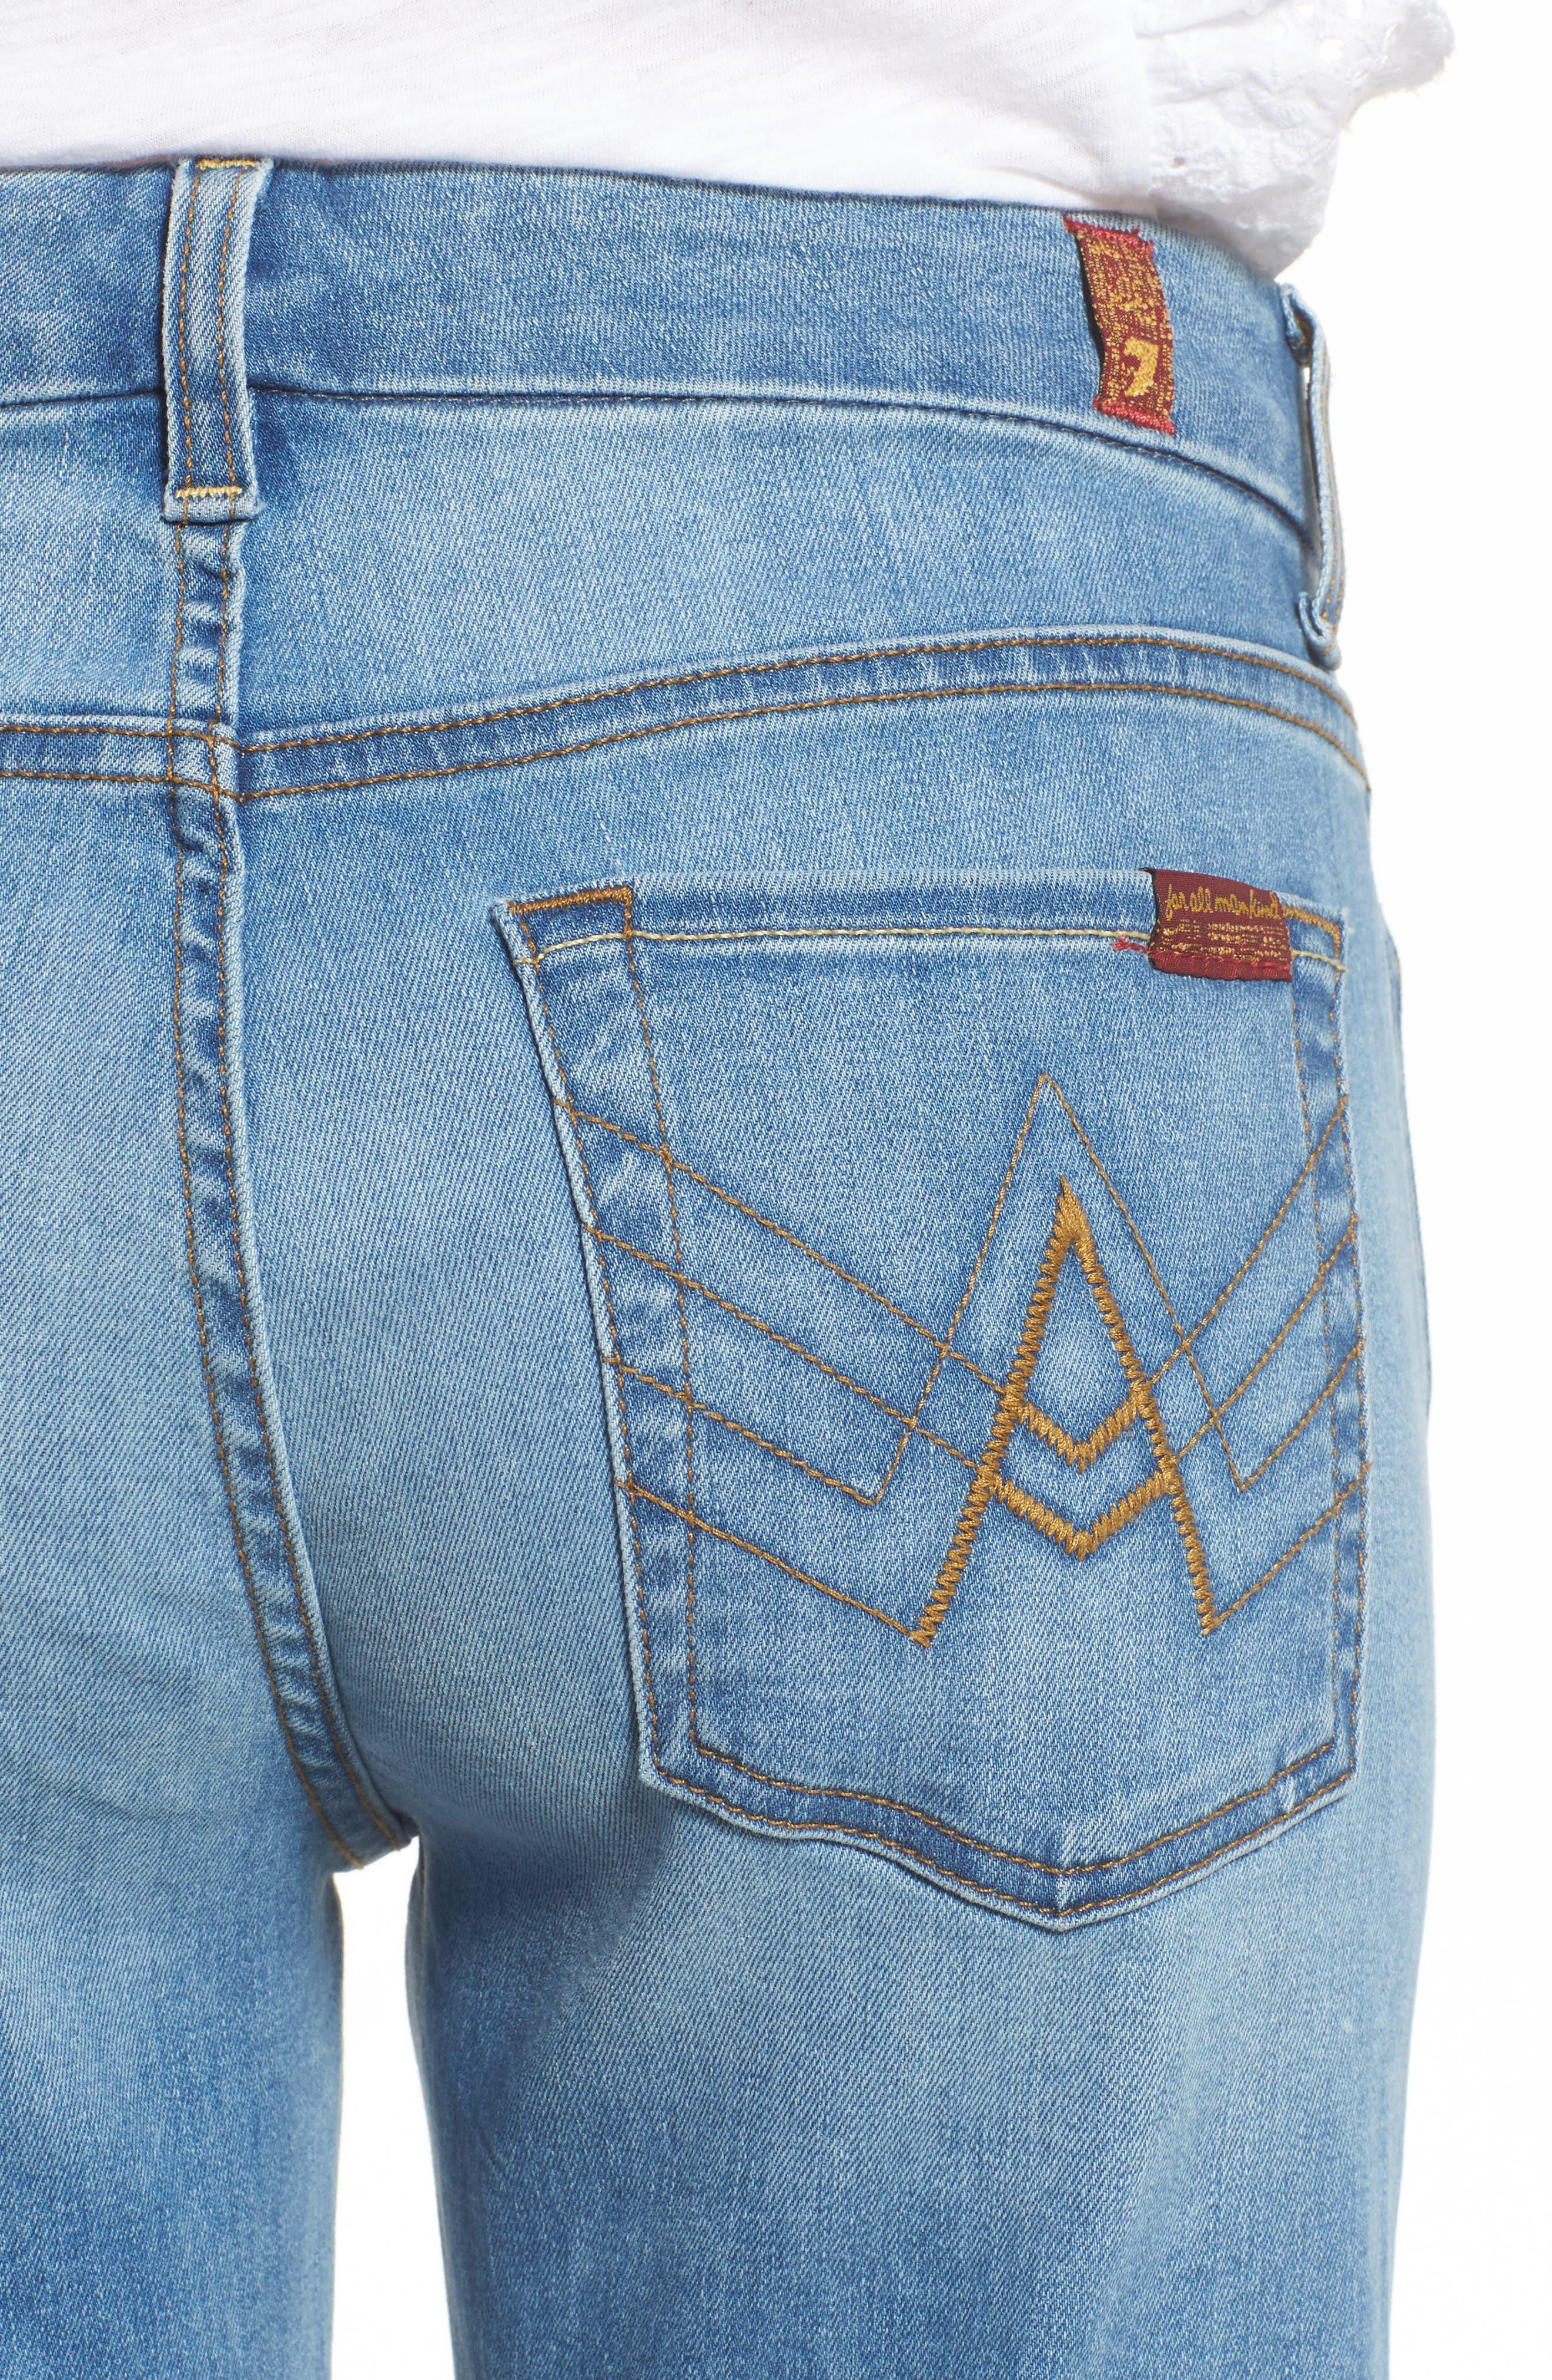 A-Pocket Flare Leg Jeans,                             Alternate thumbnail 4, color,                             401